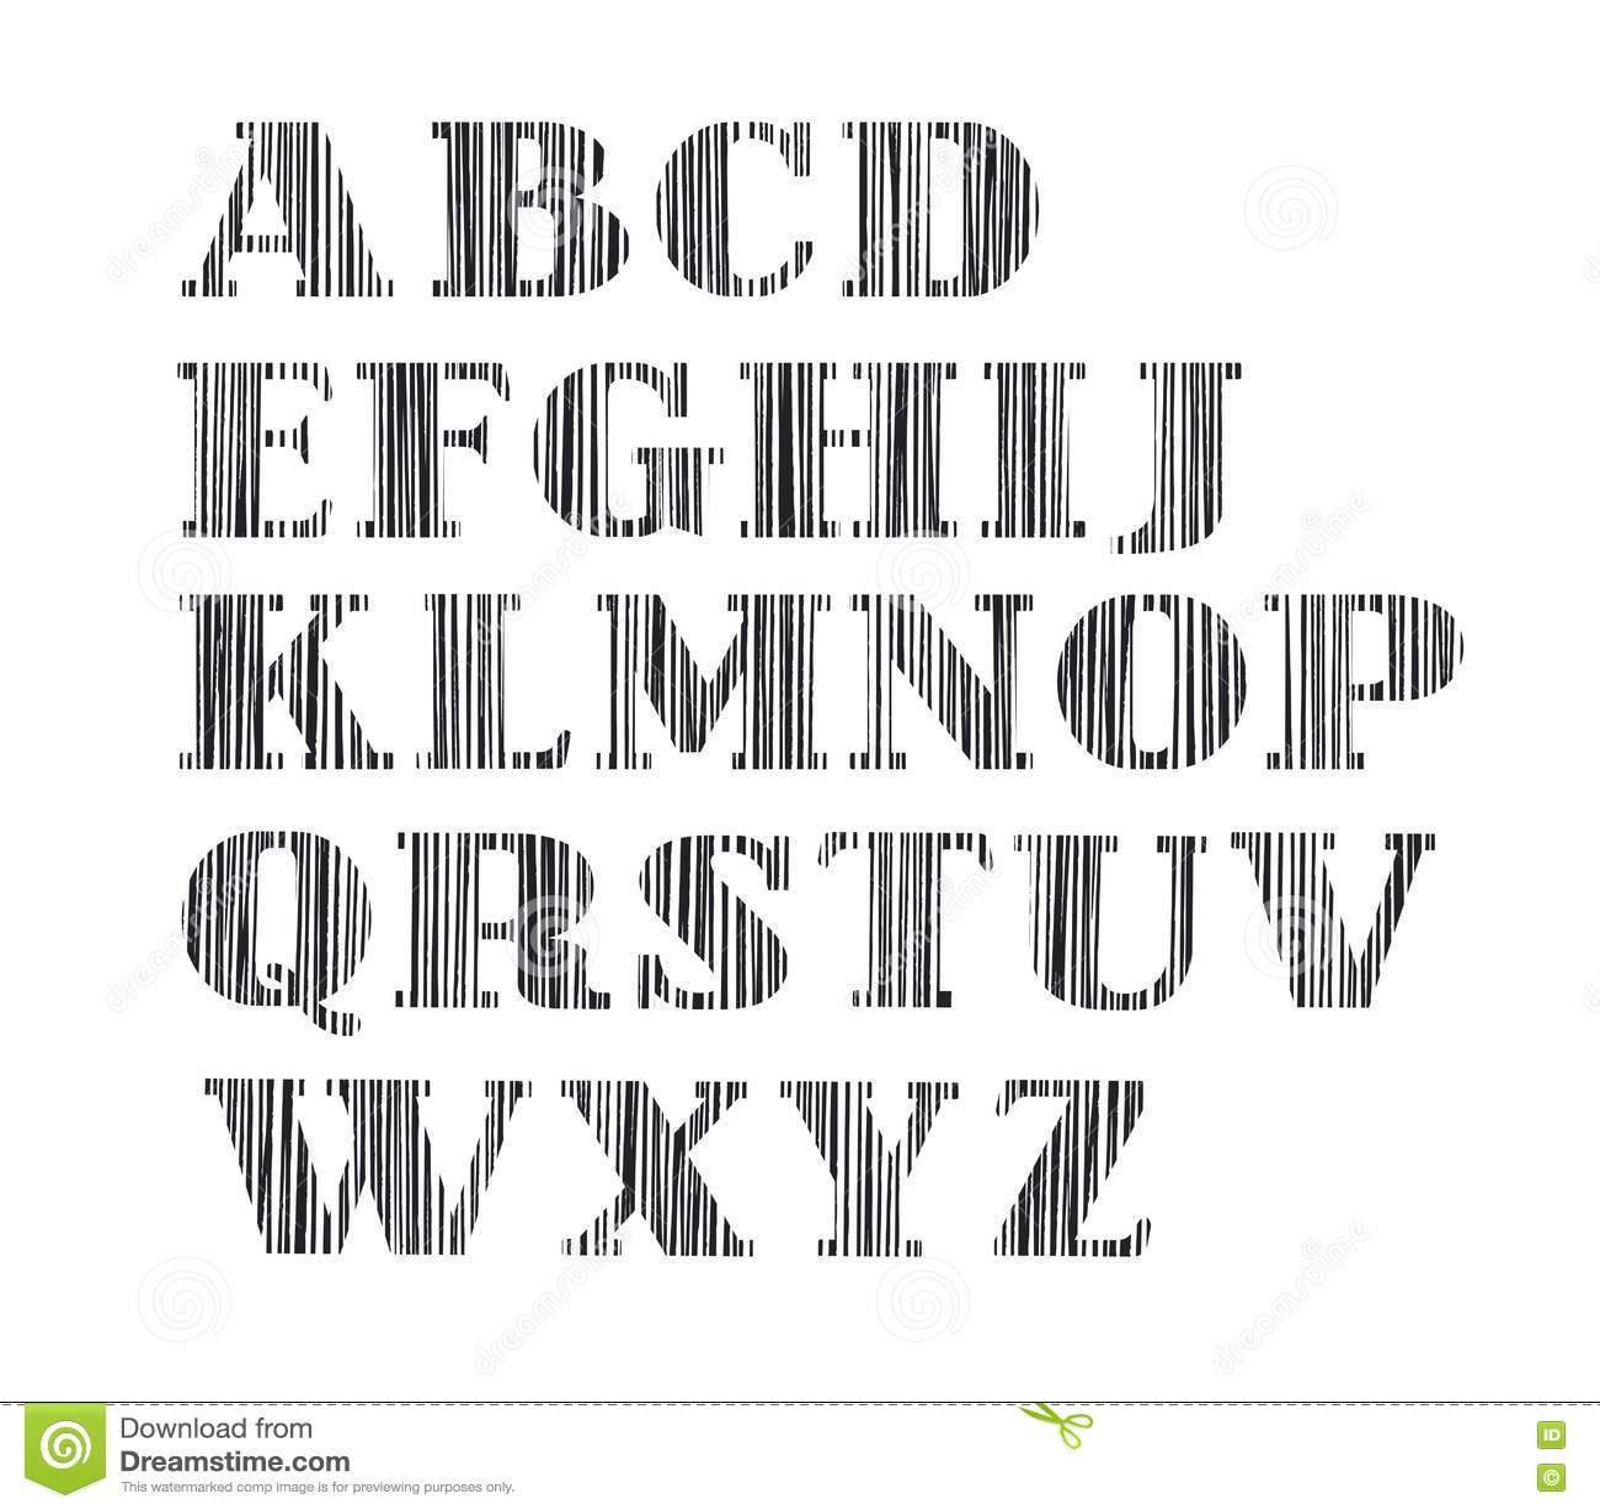 English Alphabet Capital Letter Vertical Shading Pencil